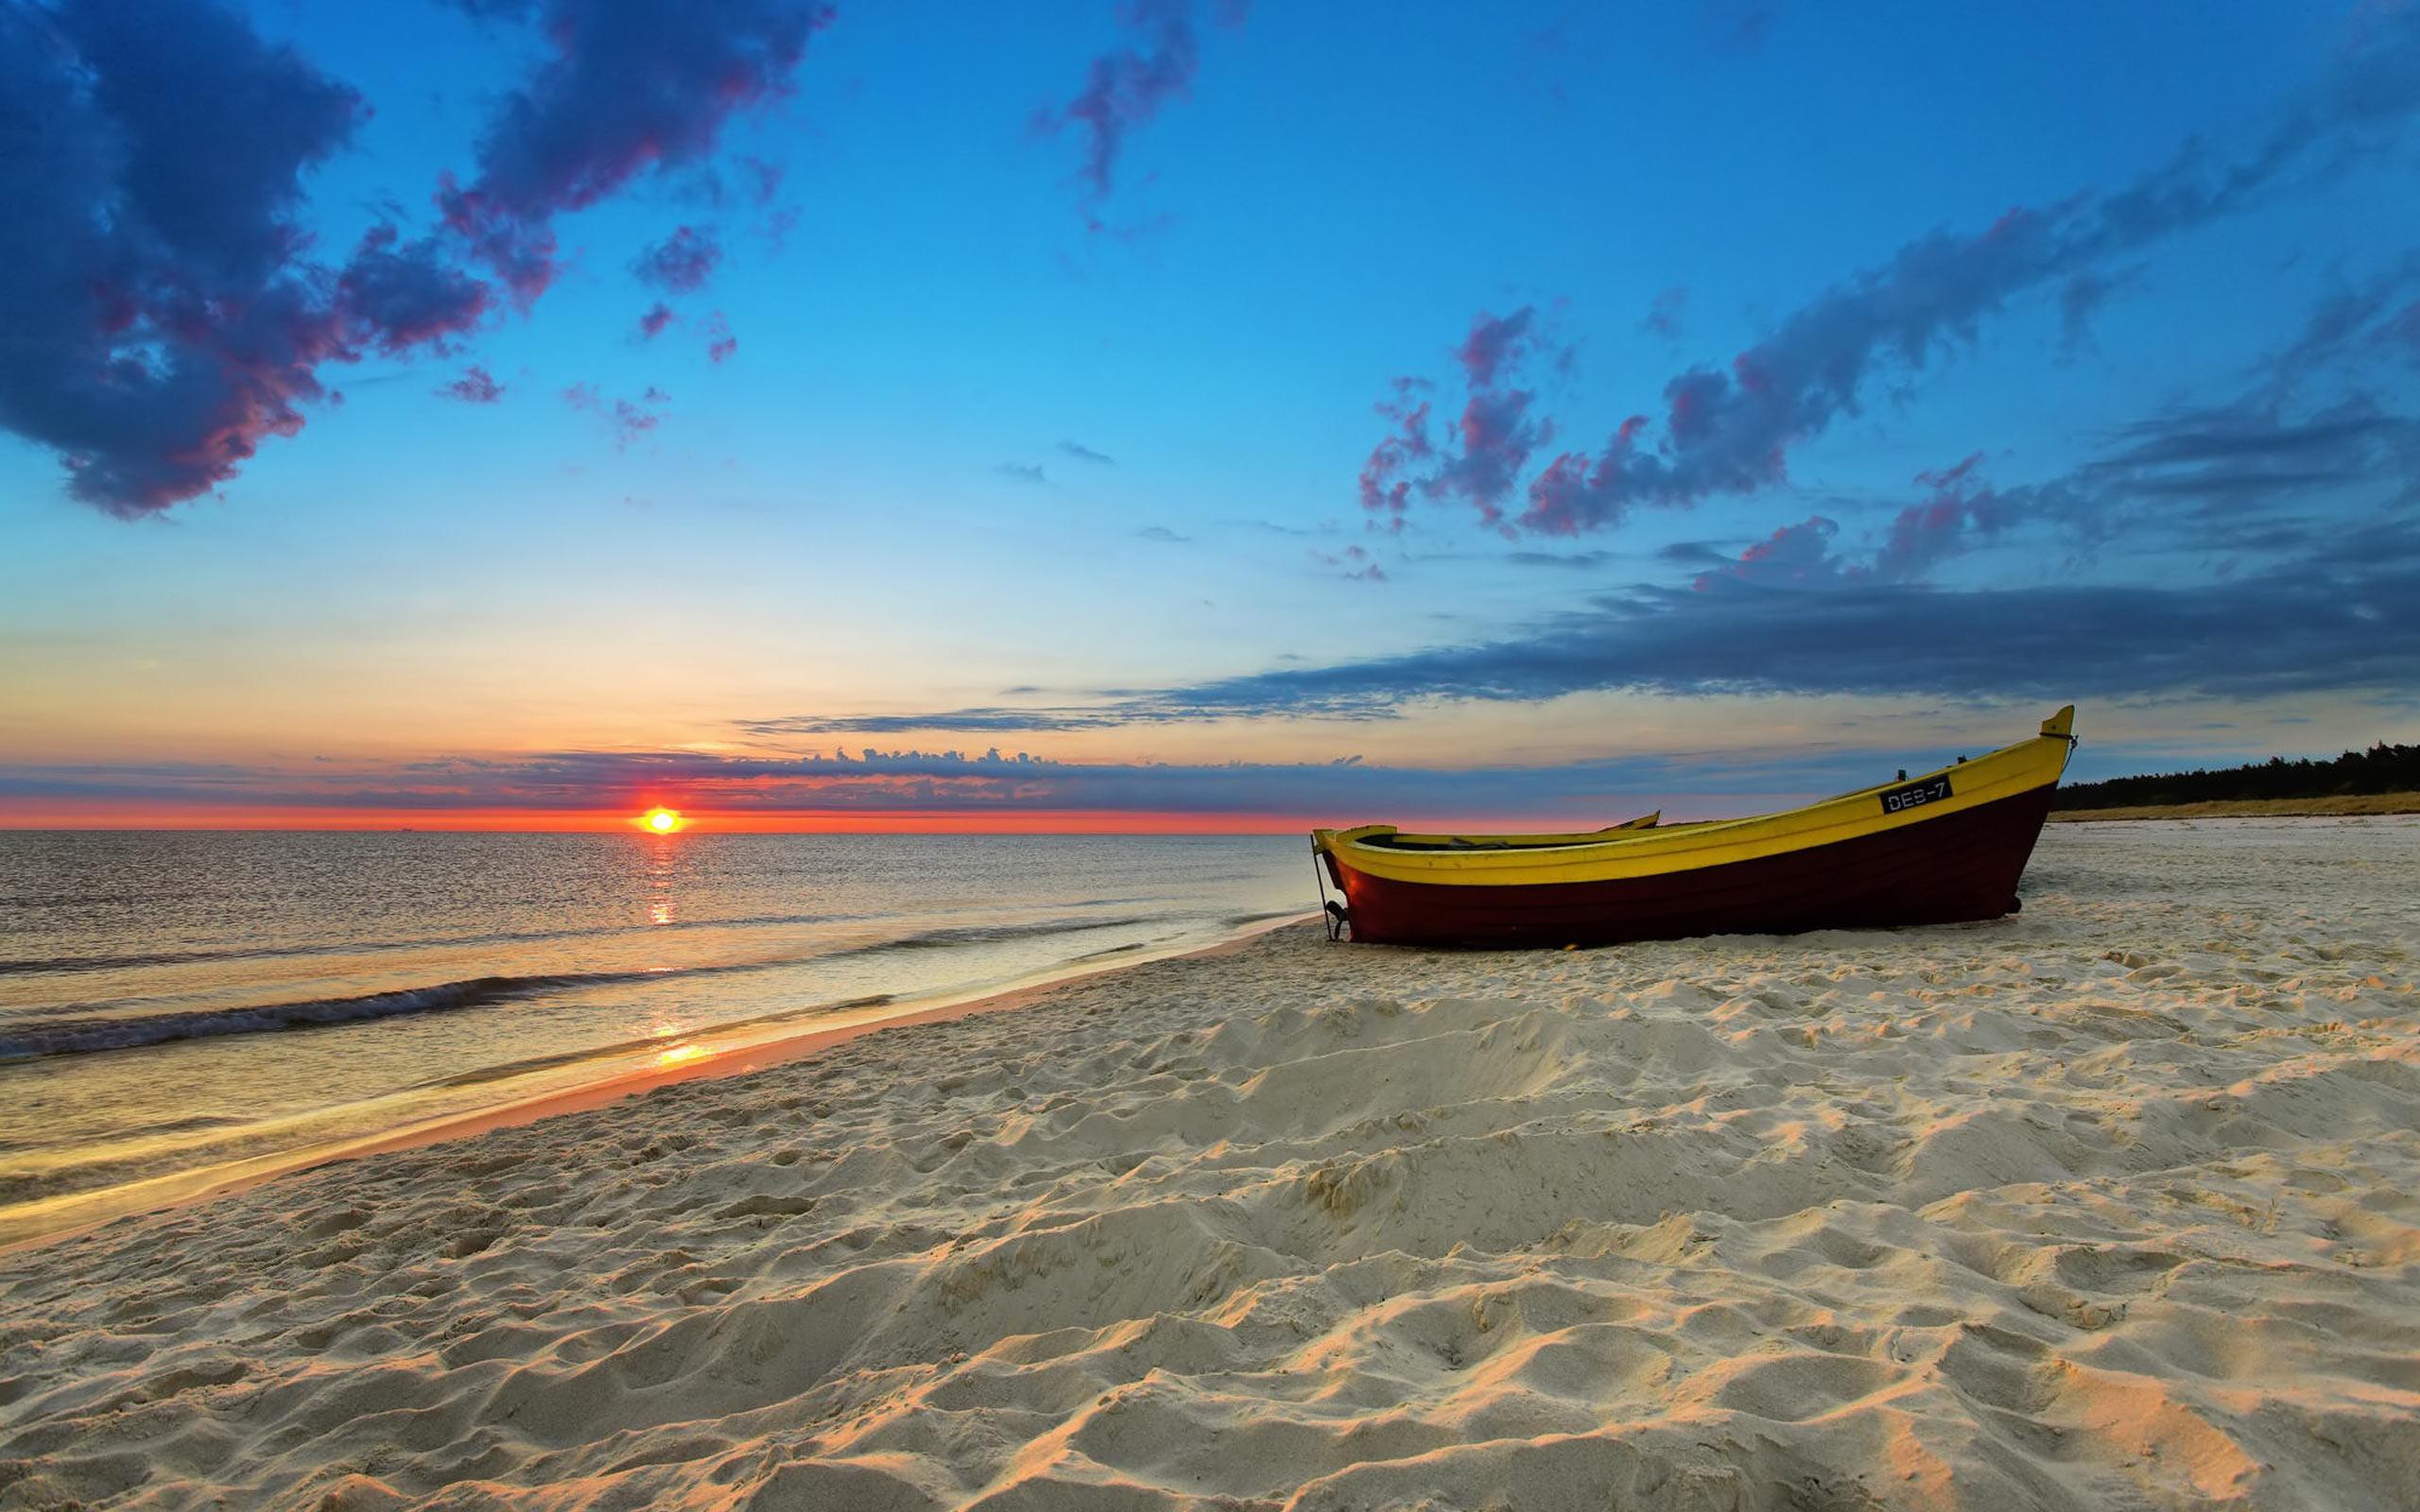 HD wallpaper : Sunset On The Beach Desktop Wallpaper Sand Boats by ...